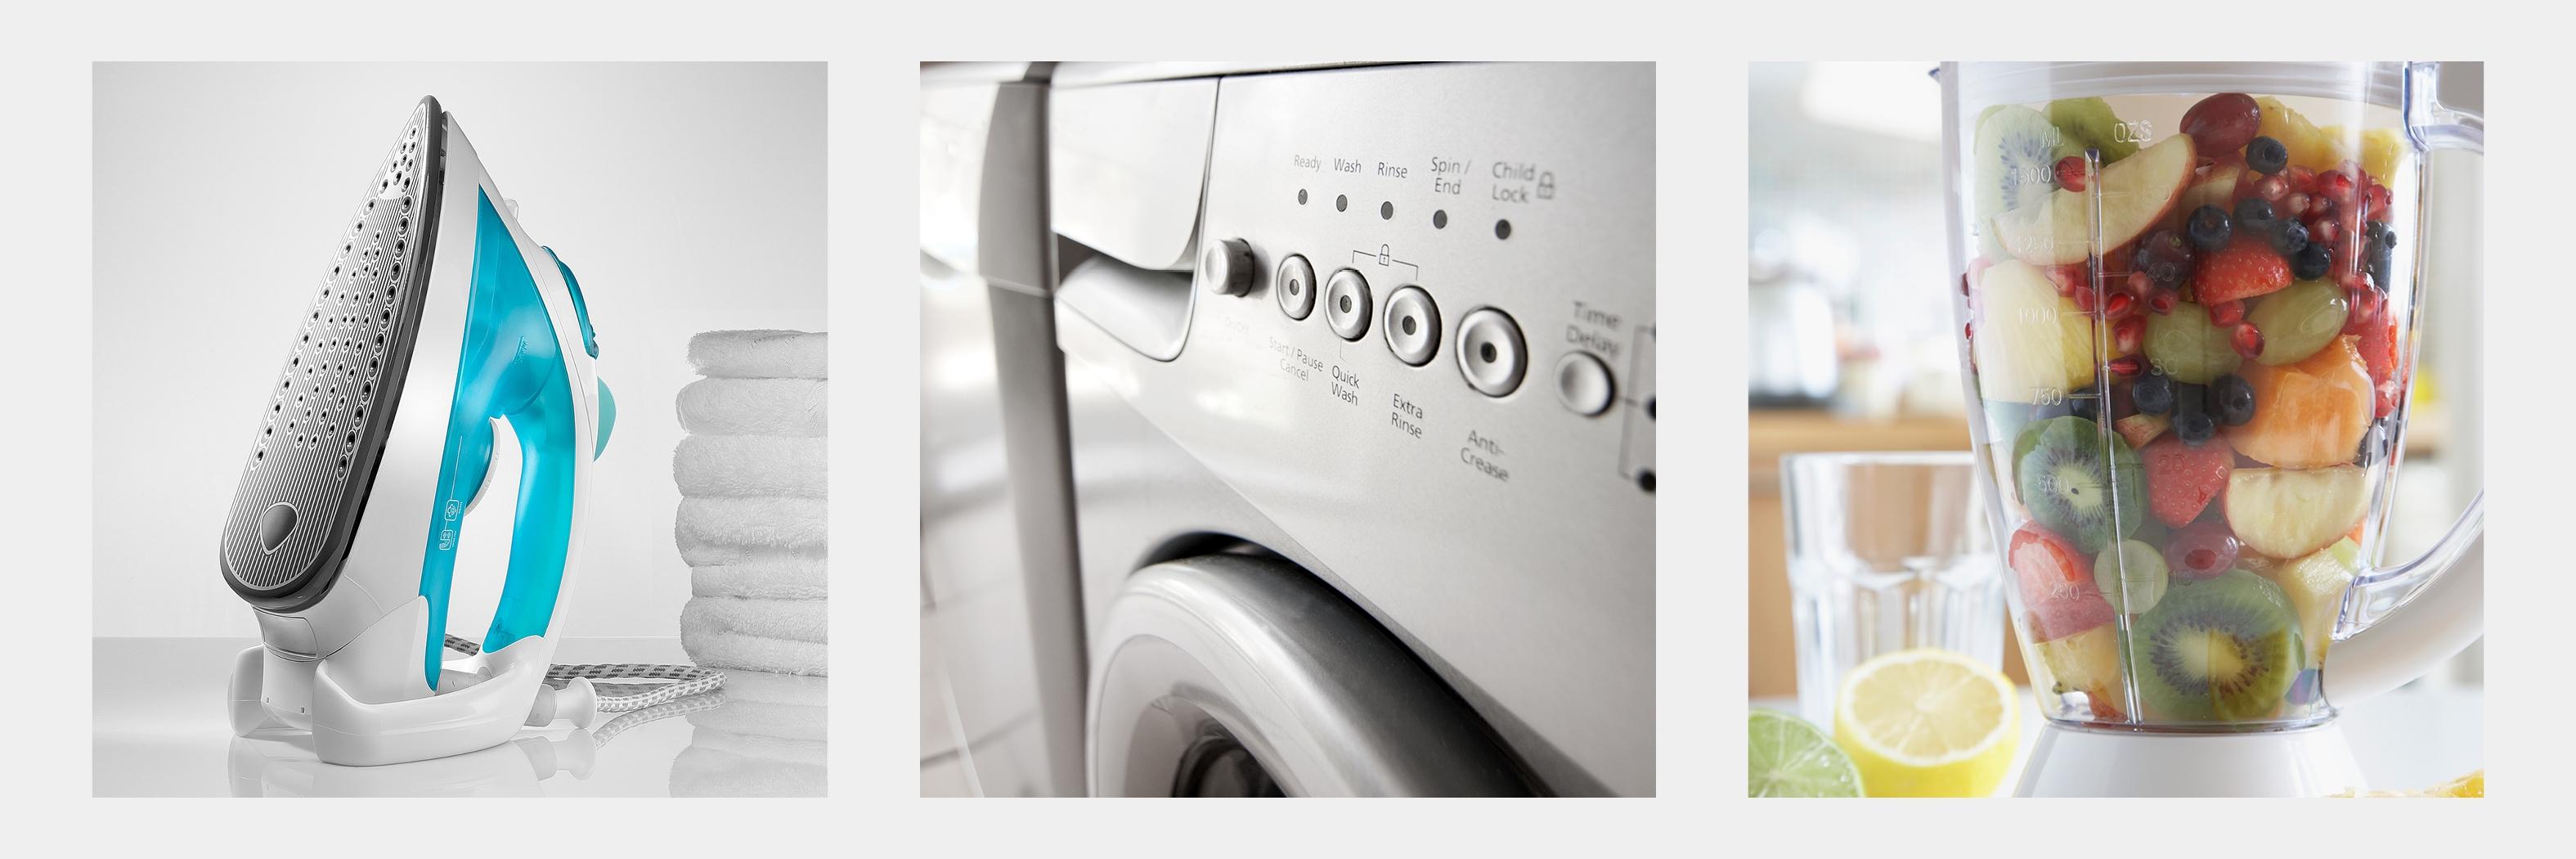 Applianes-Web-Image-Trio.jpg